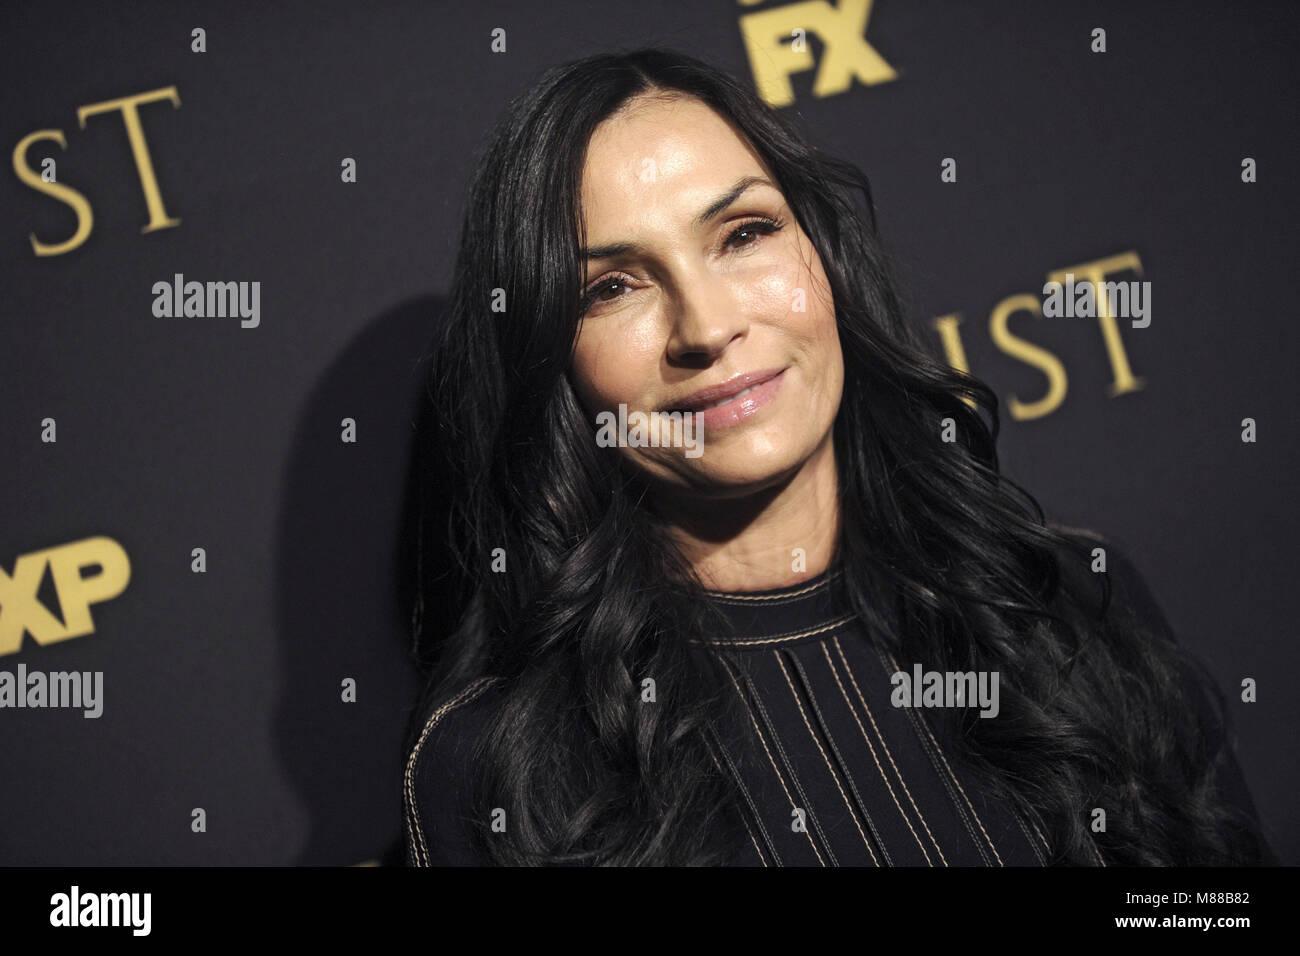 New York City. 14th Mar, 2018. Famke Janssen attending the FX Networks' 'Trust' New York Screening at - Stock Image